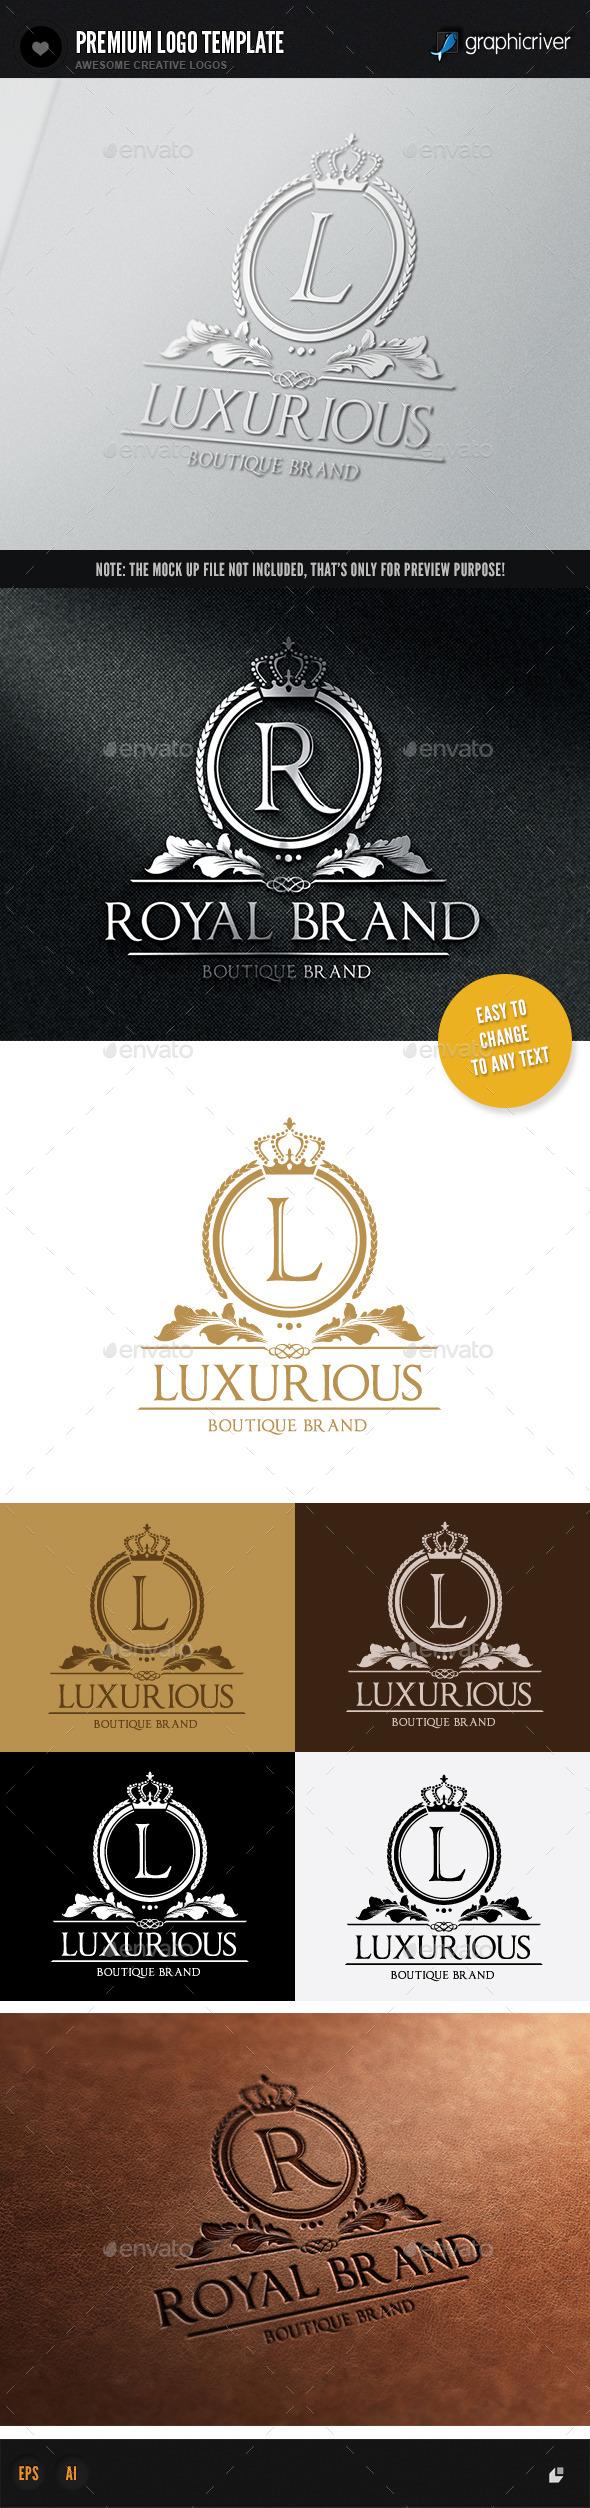 Luxurious Brand